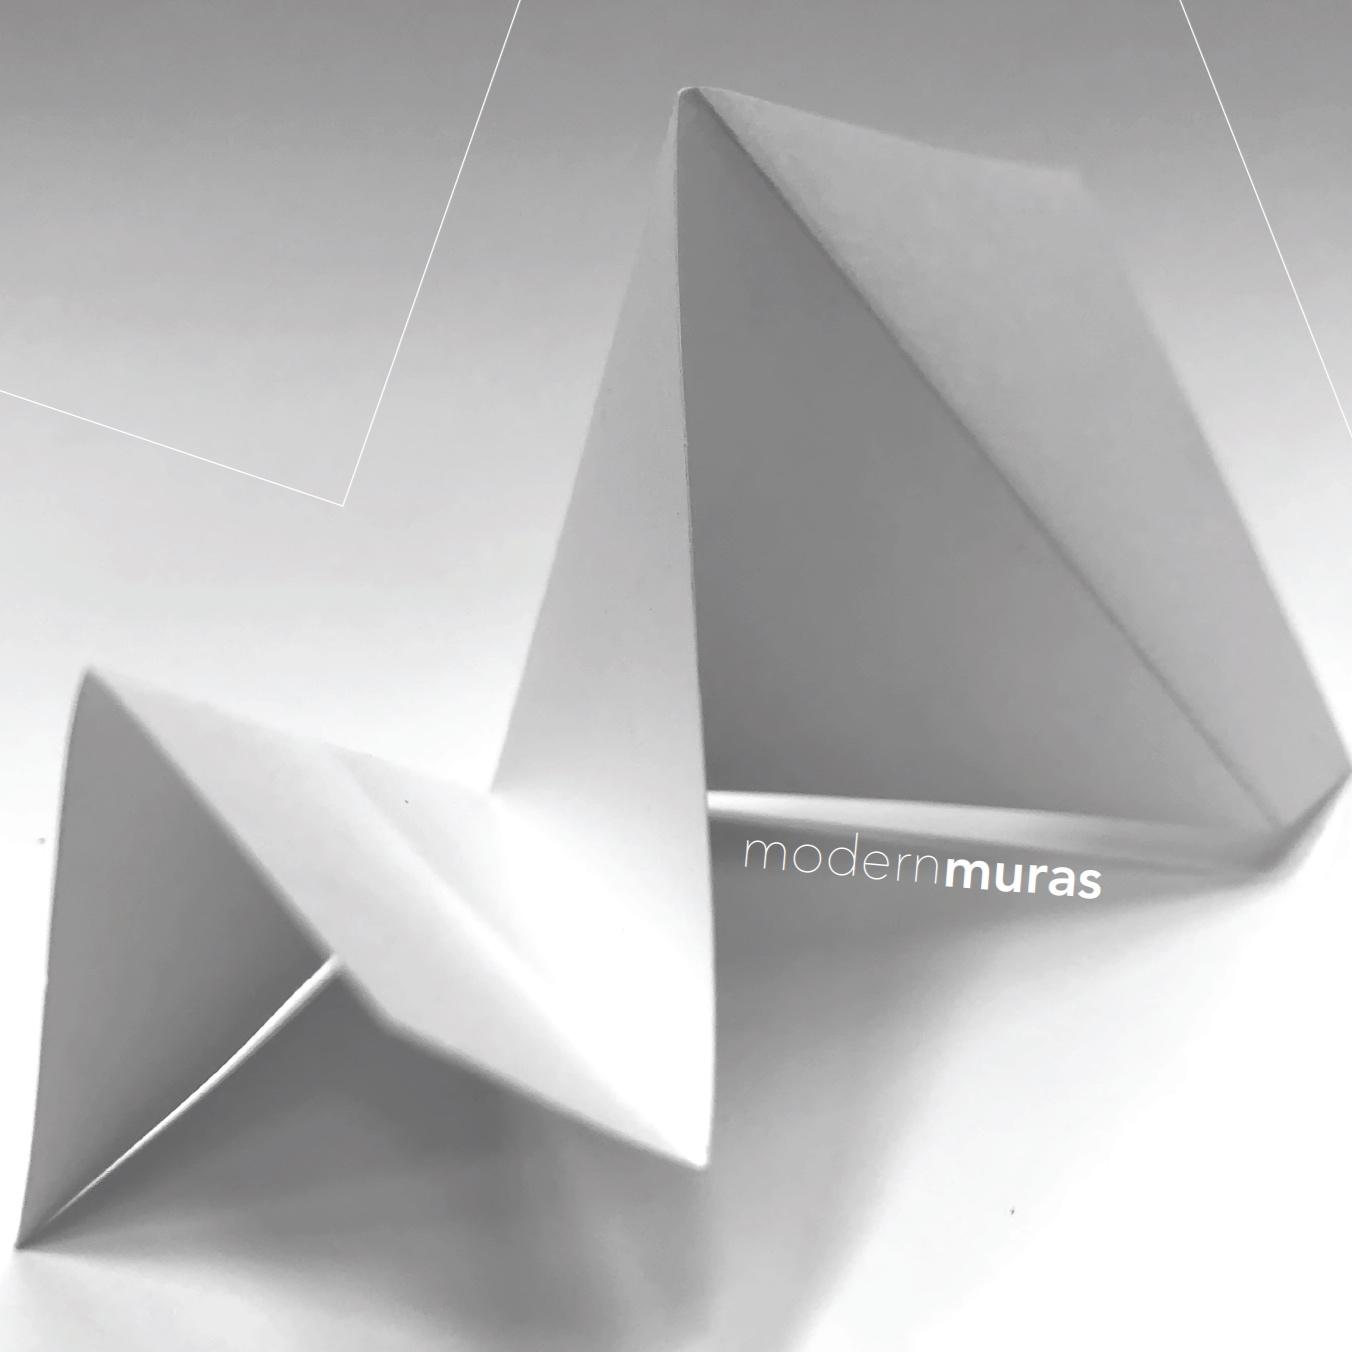 SPARANO + MOONEY ARCHITECTURE / U OF U SCHOOL OF ARCHITECTURE: MODERNMURAS